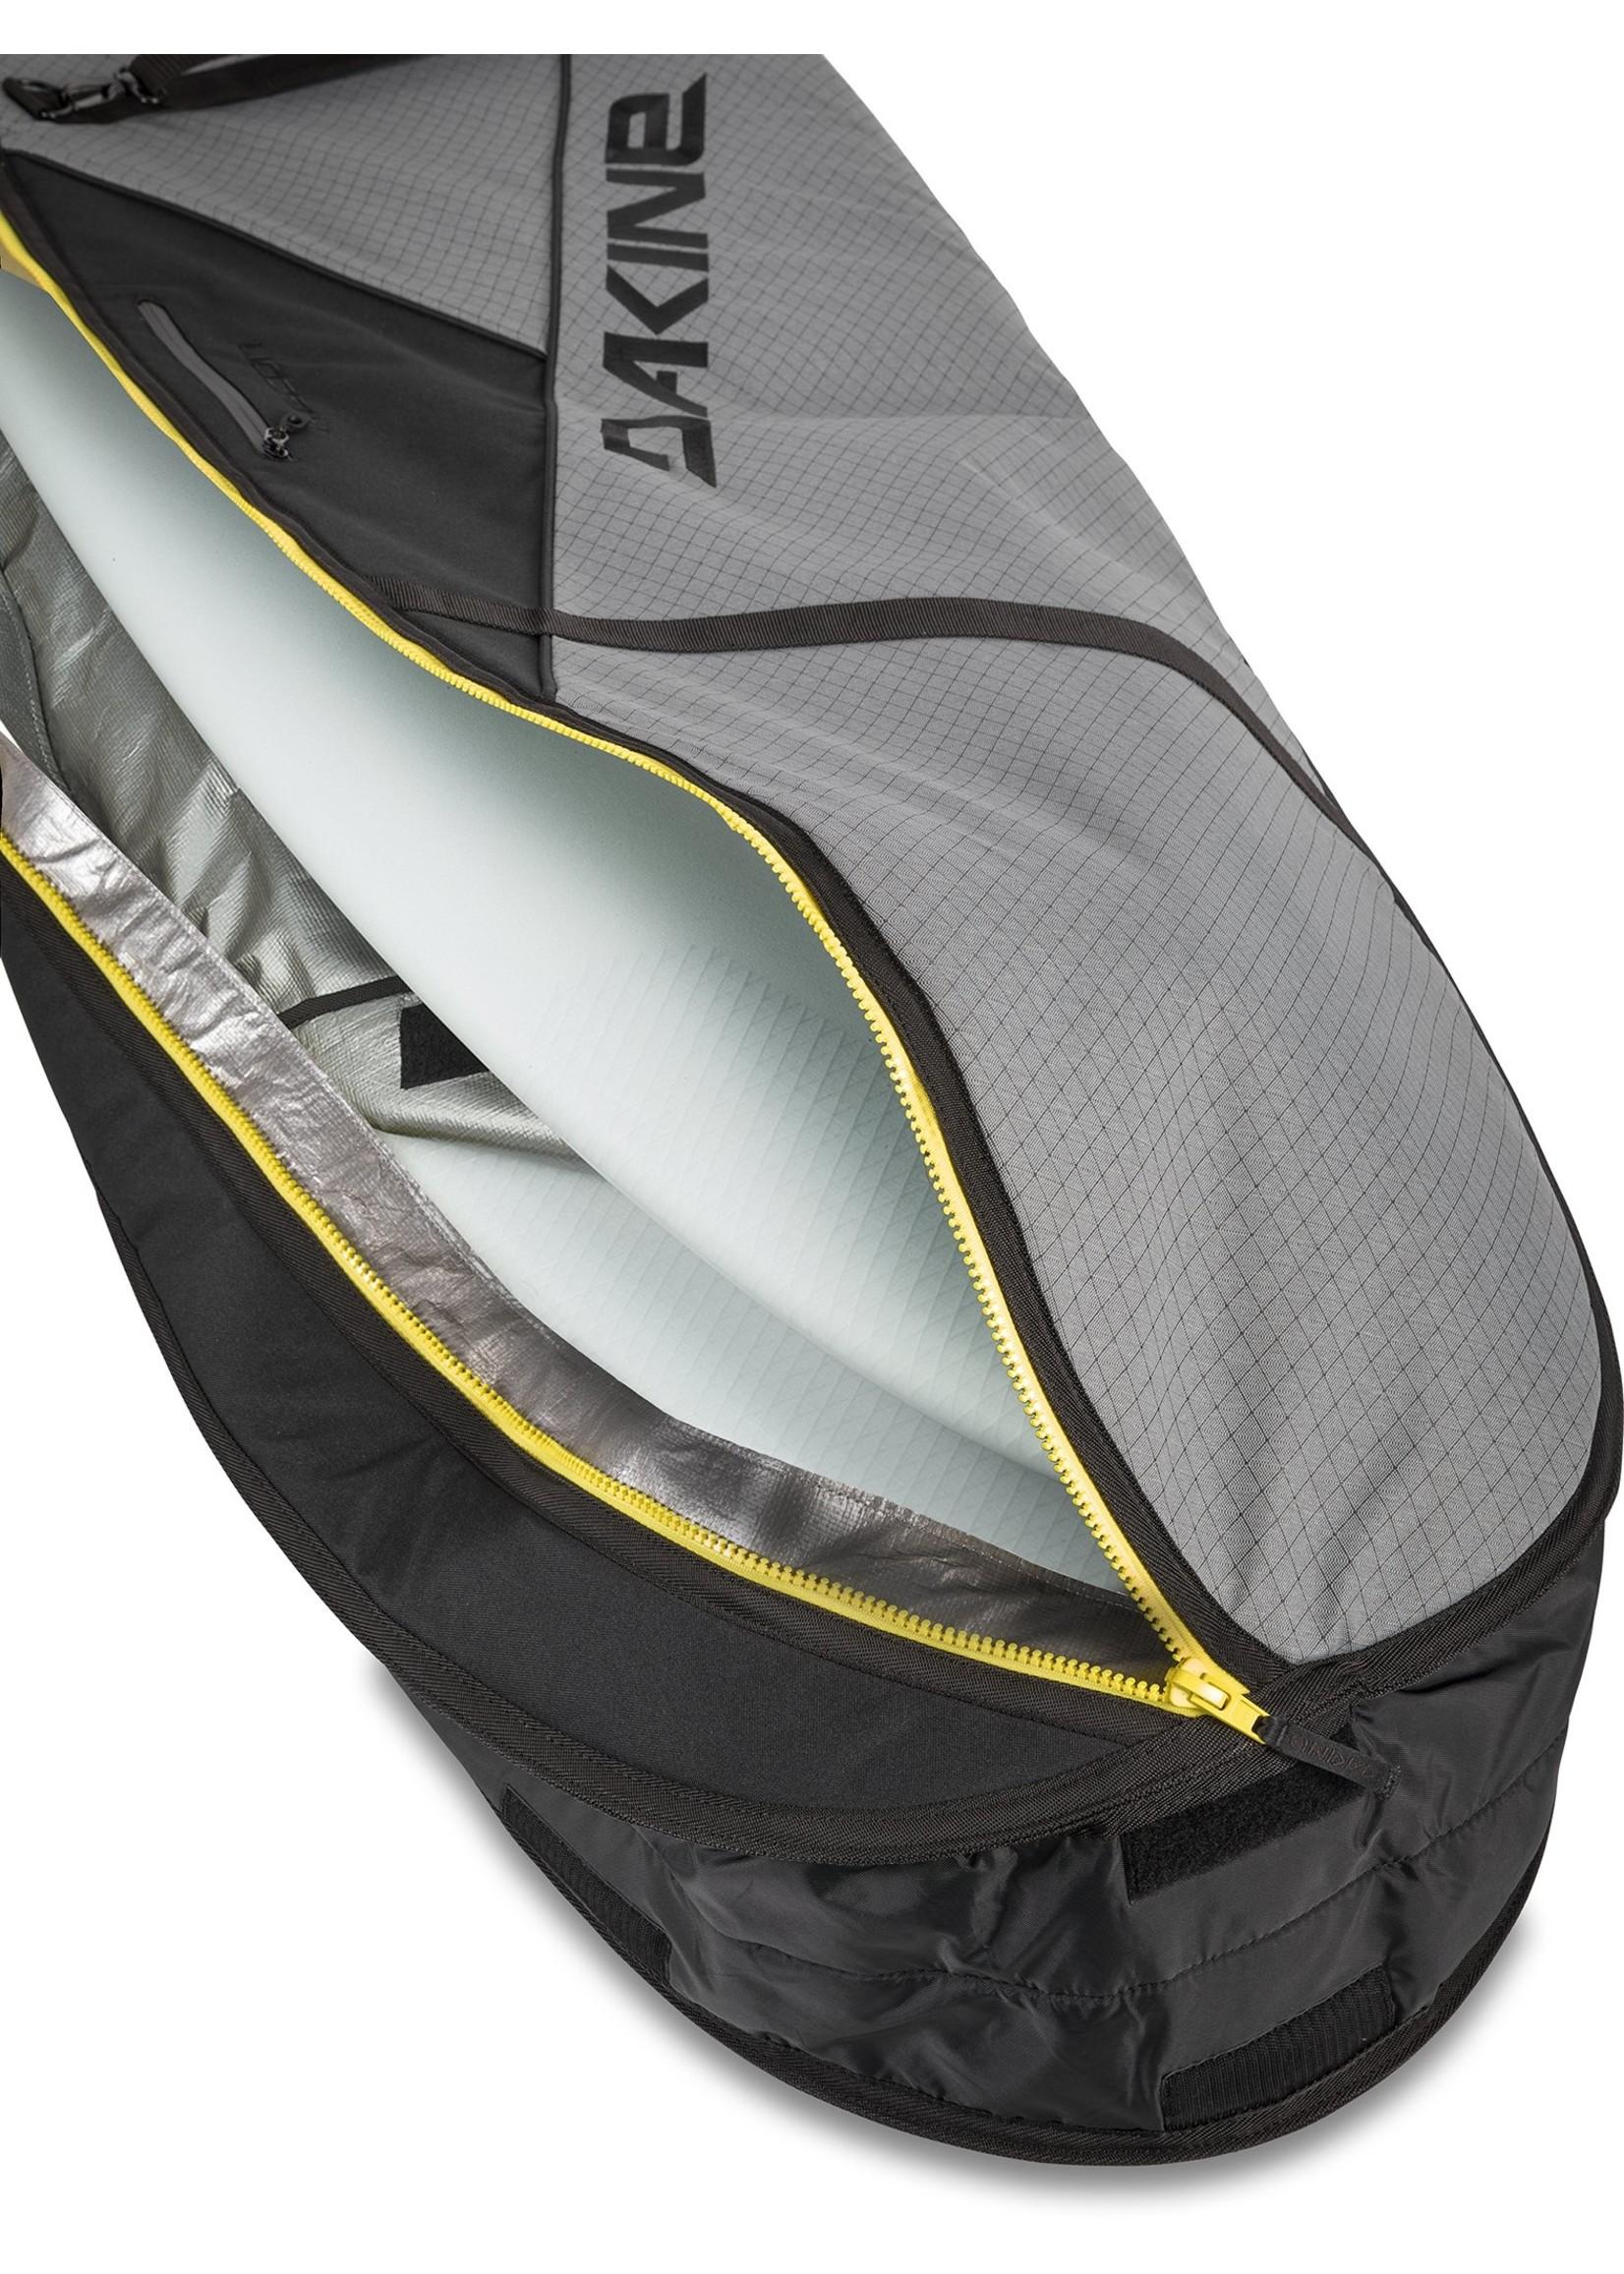 Dakine RECON DOUBLE SURFBOARD BAG - THRUSTER 7'